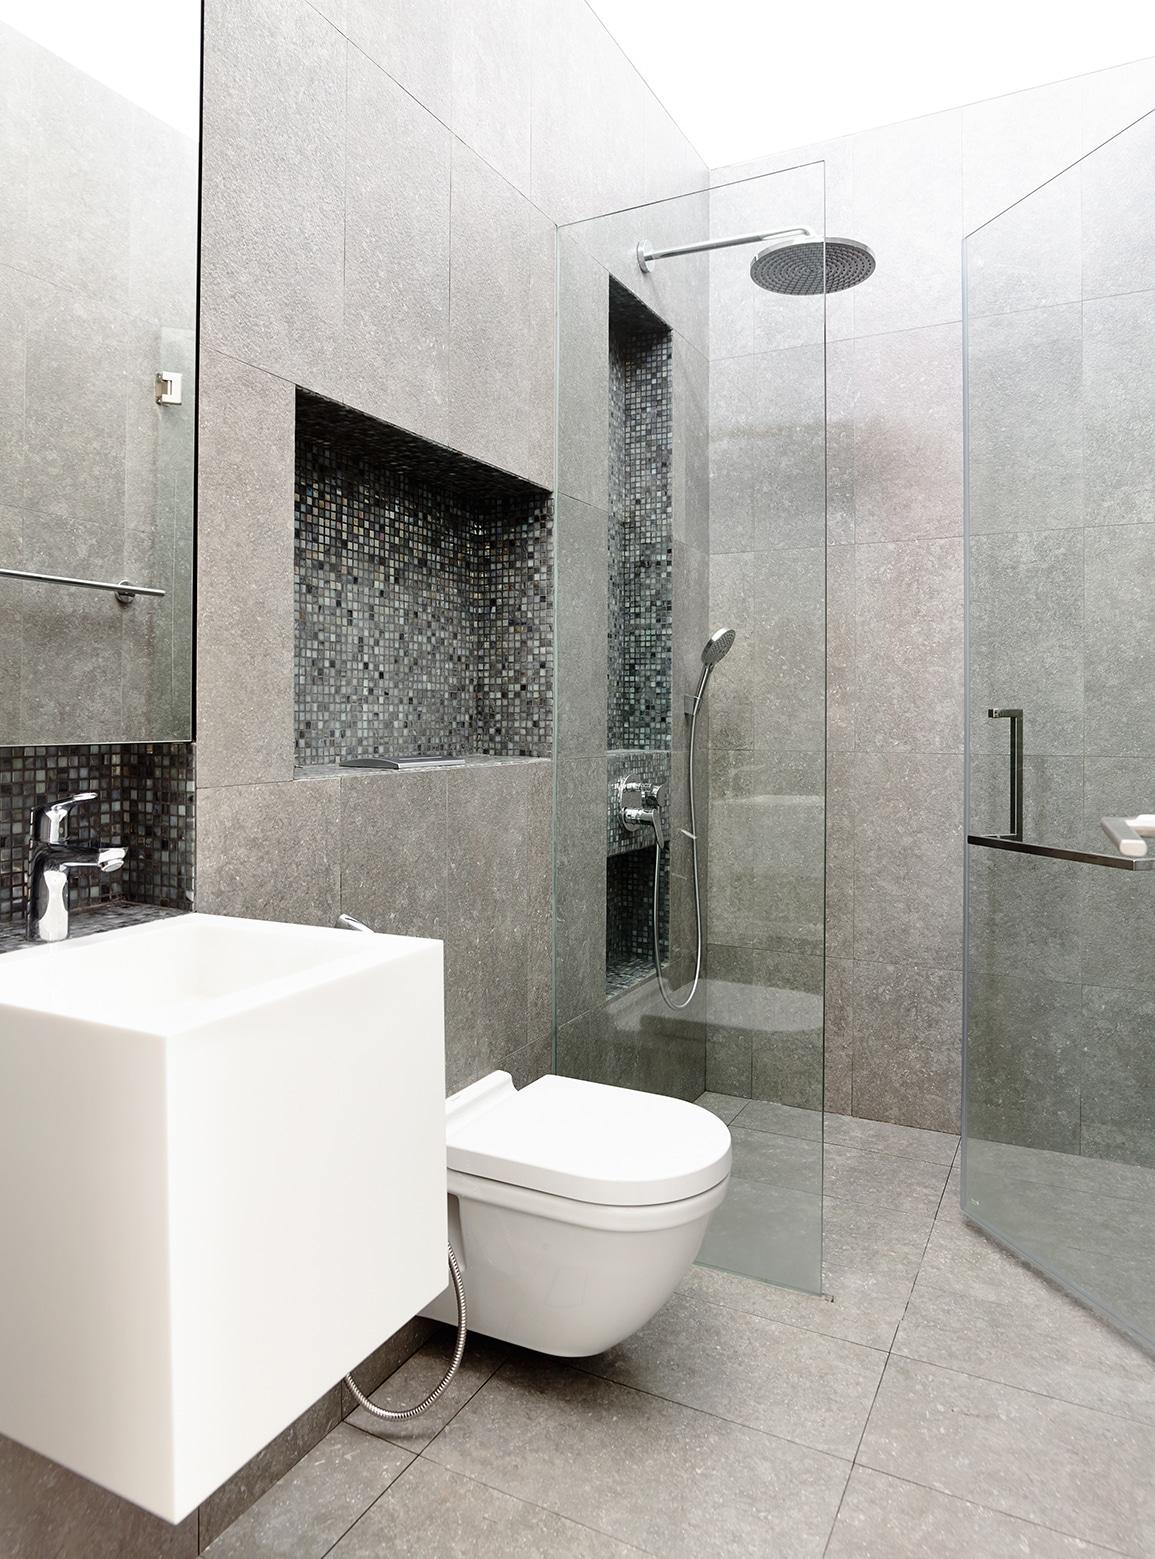 Planos de casa angosta y larga tres pisos construye hogar - Banos fotos modernos ...